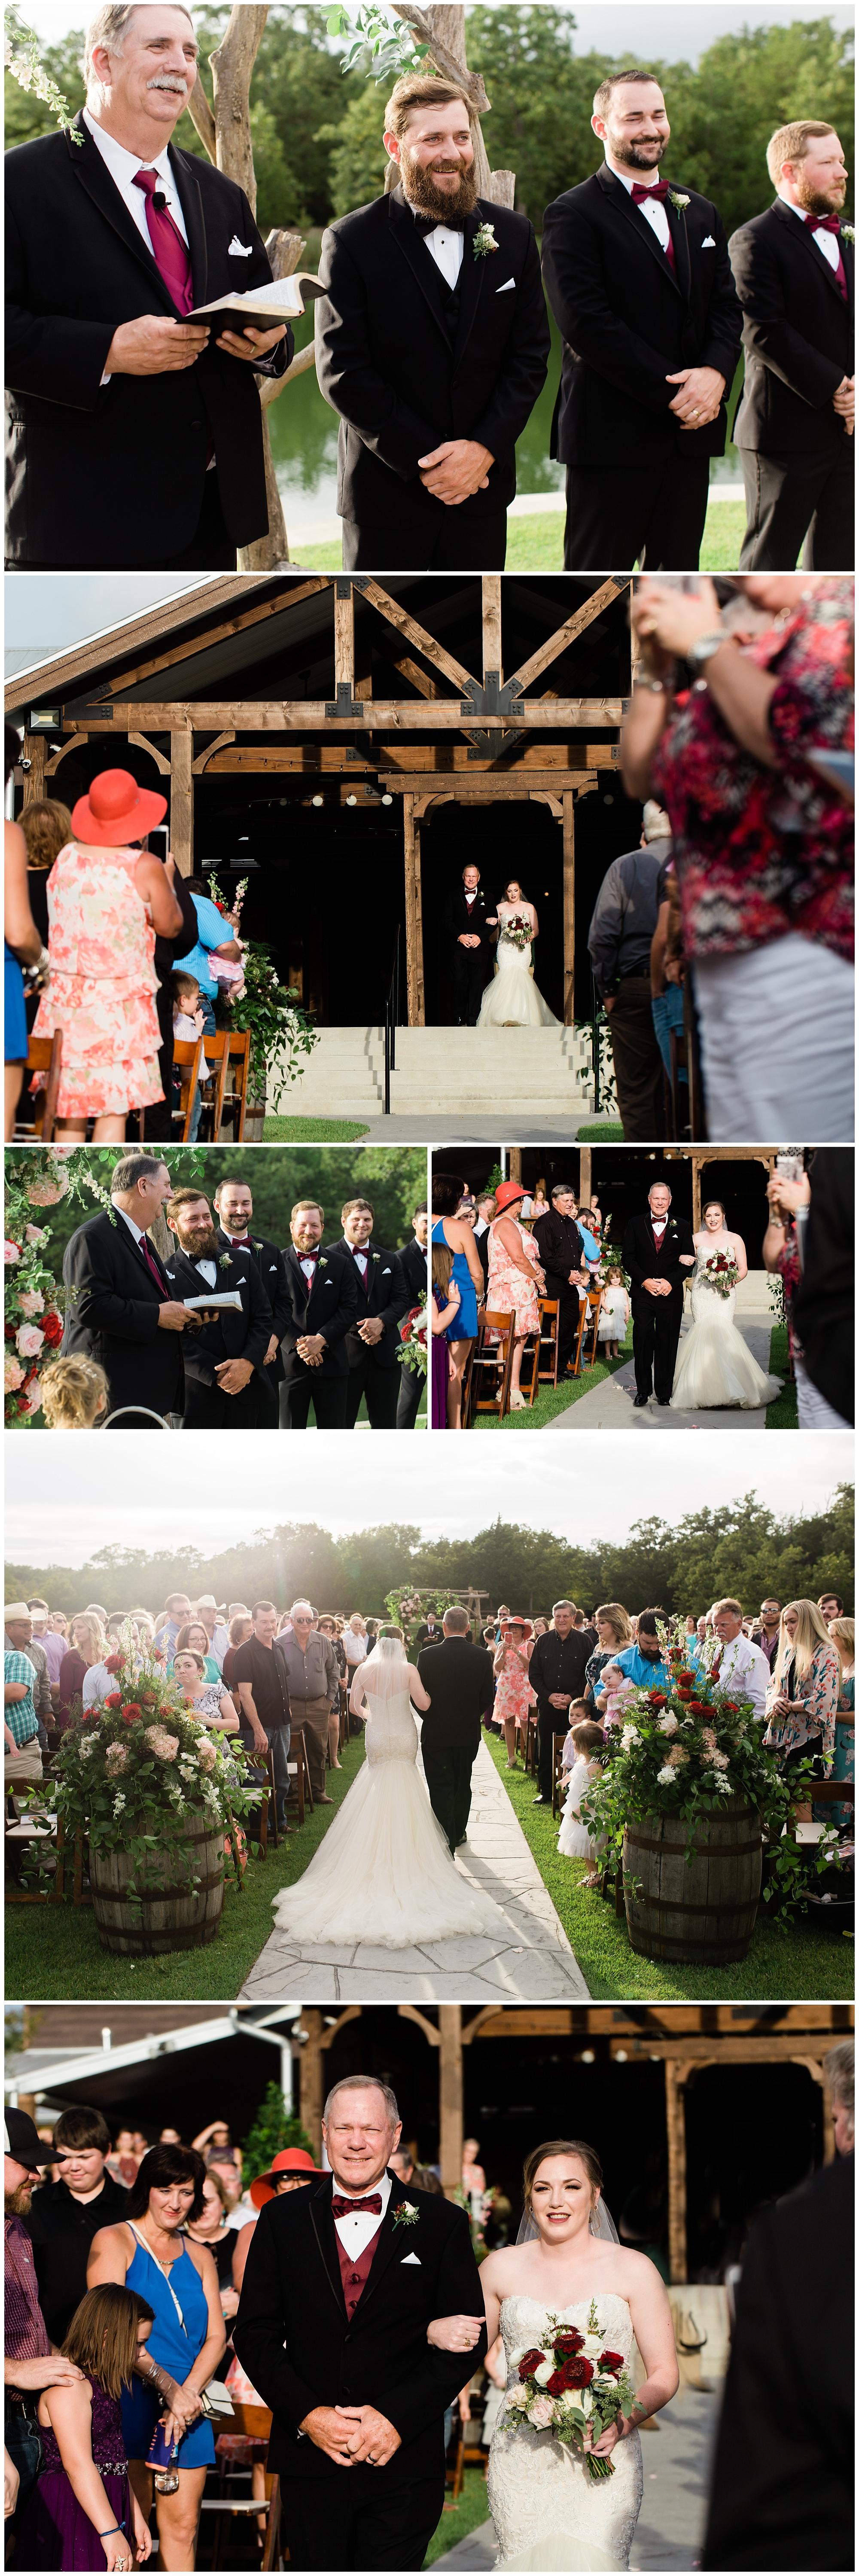 Peach_Creek_Ranch_Wedding_Kristina_Ross_Photography_0015.jpg